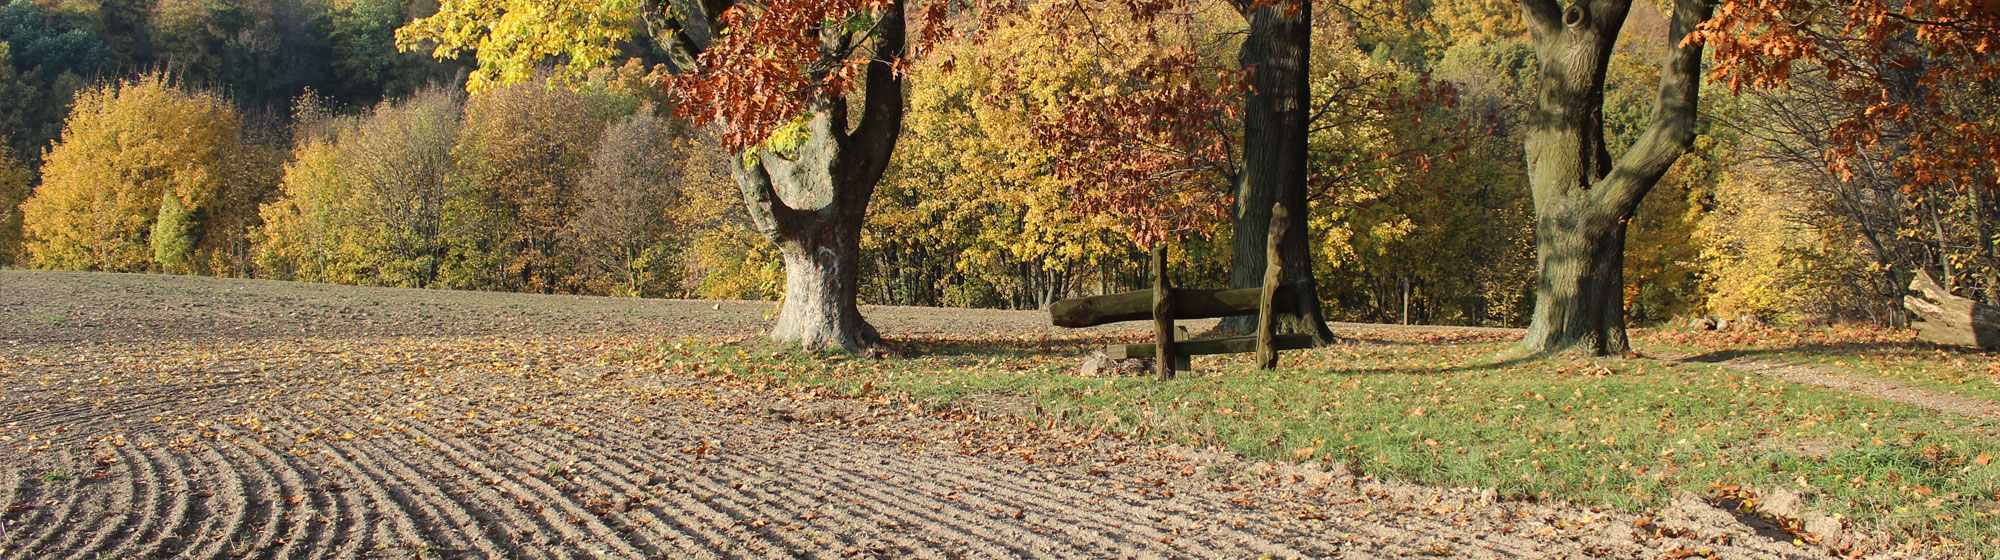 Stadtgut Görlitz Herbstfeld.jpg